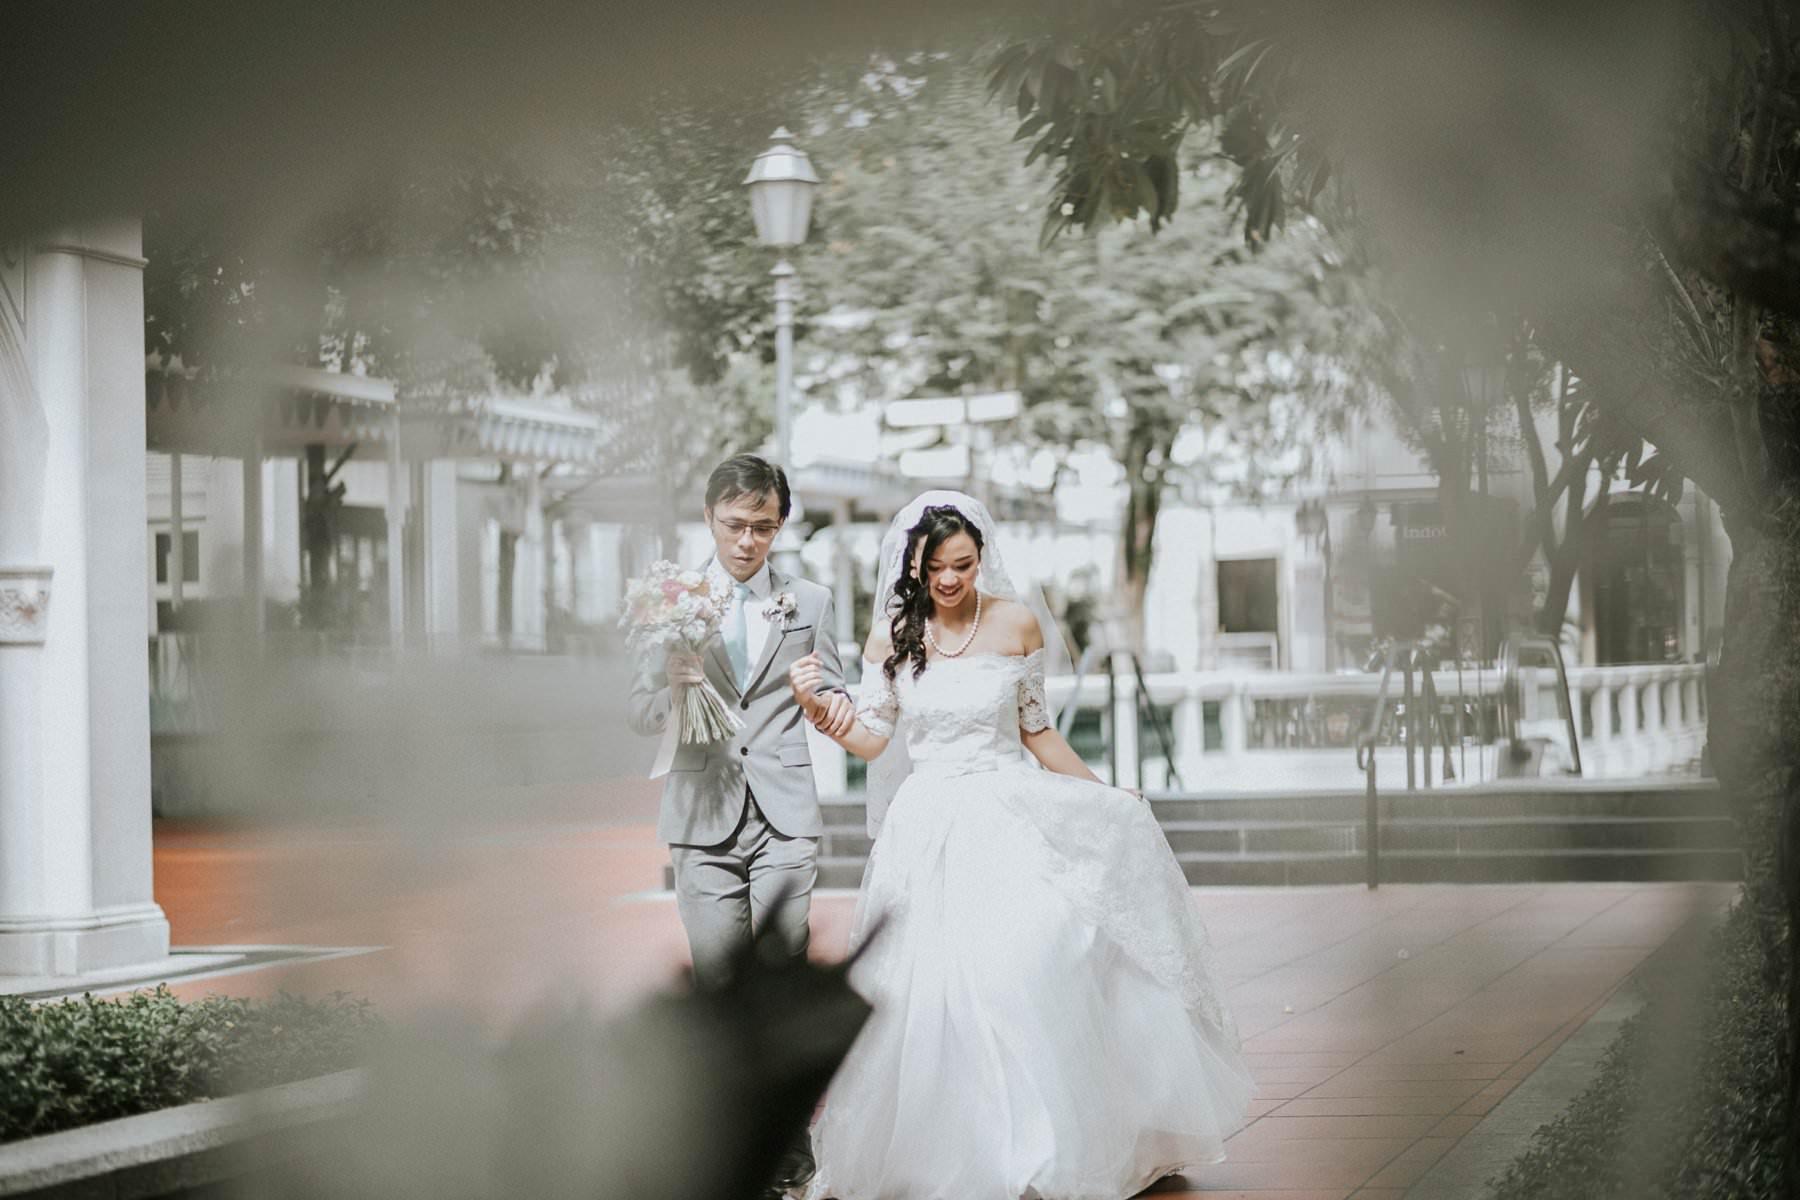 Singapore_Chijmes_Hall_Wedding_0055